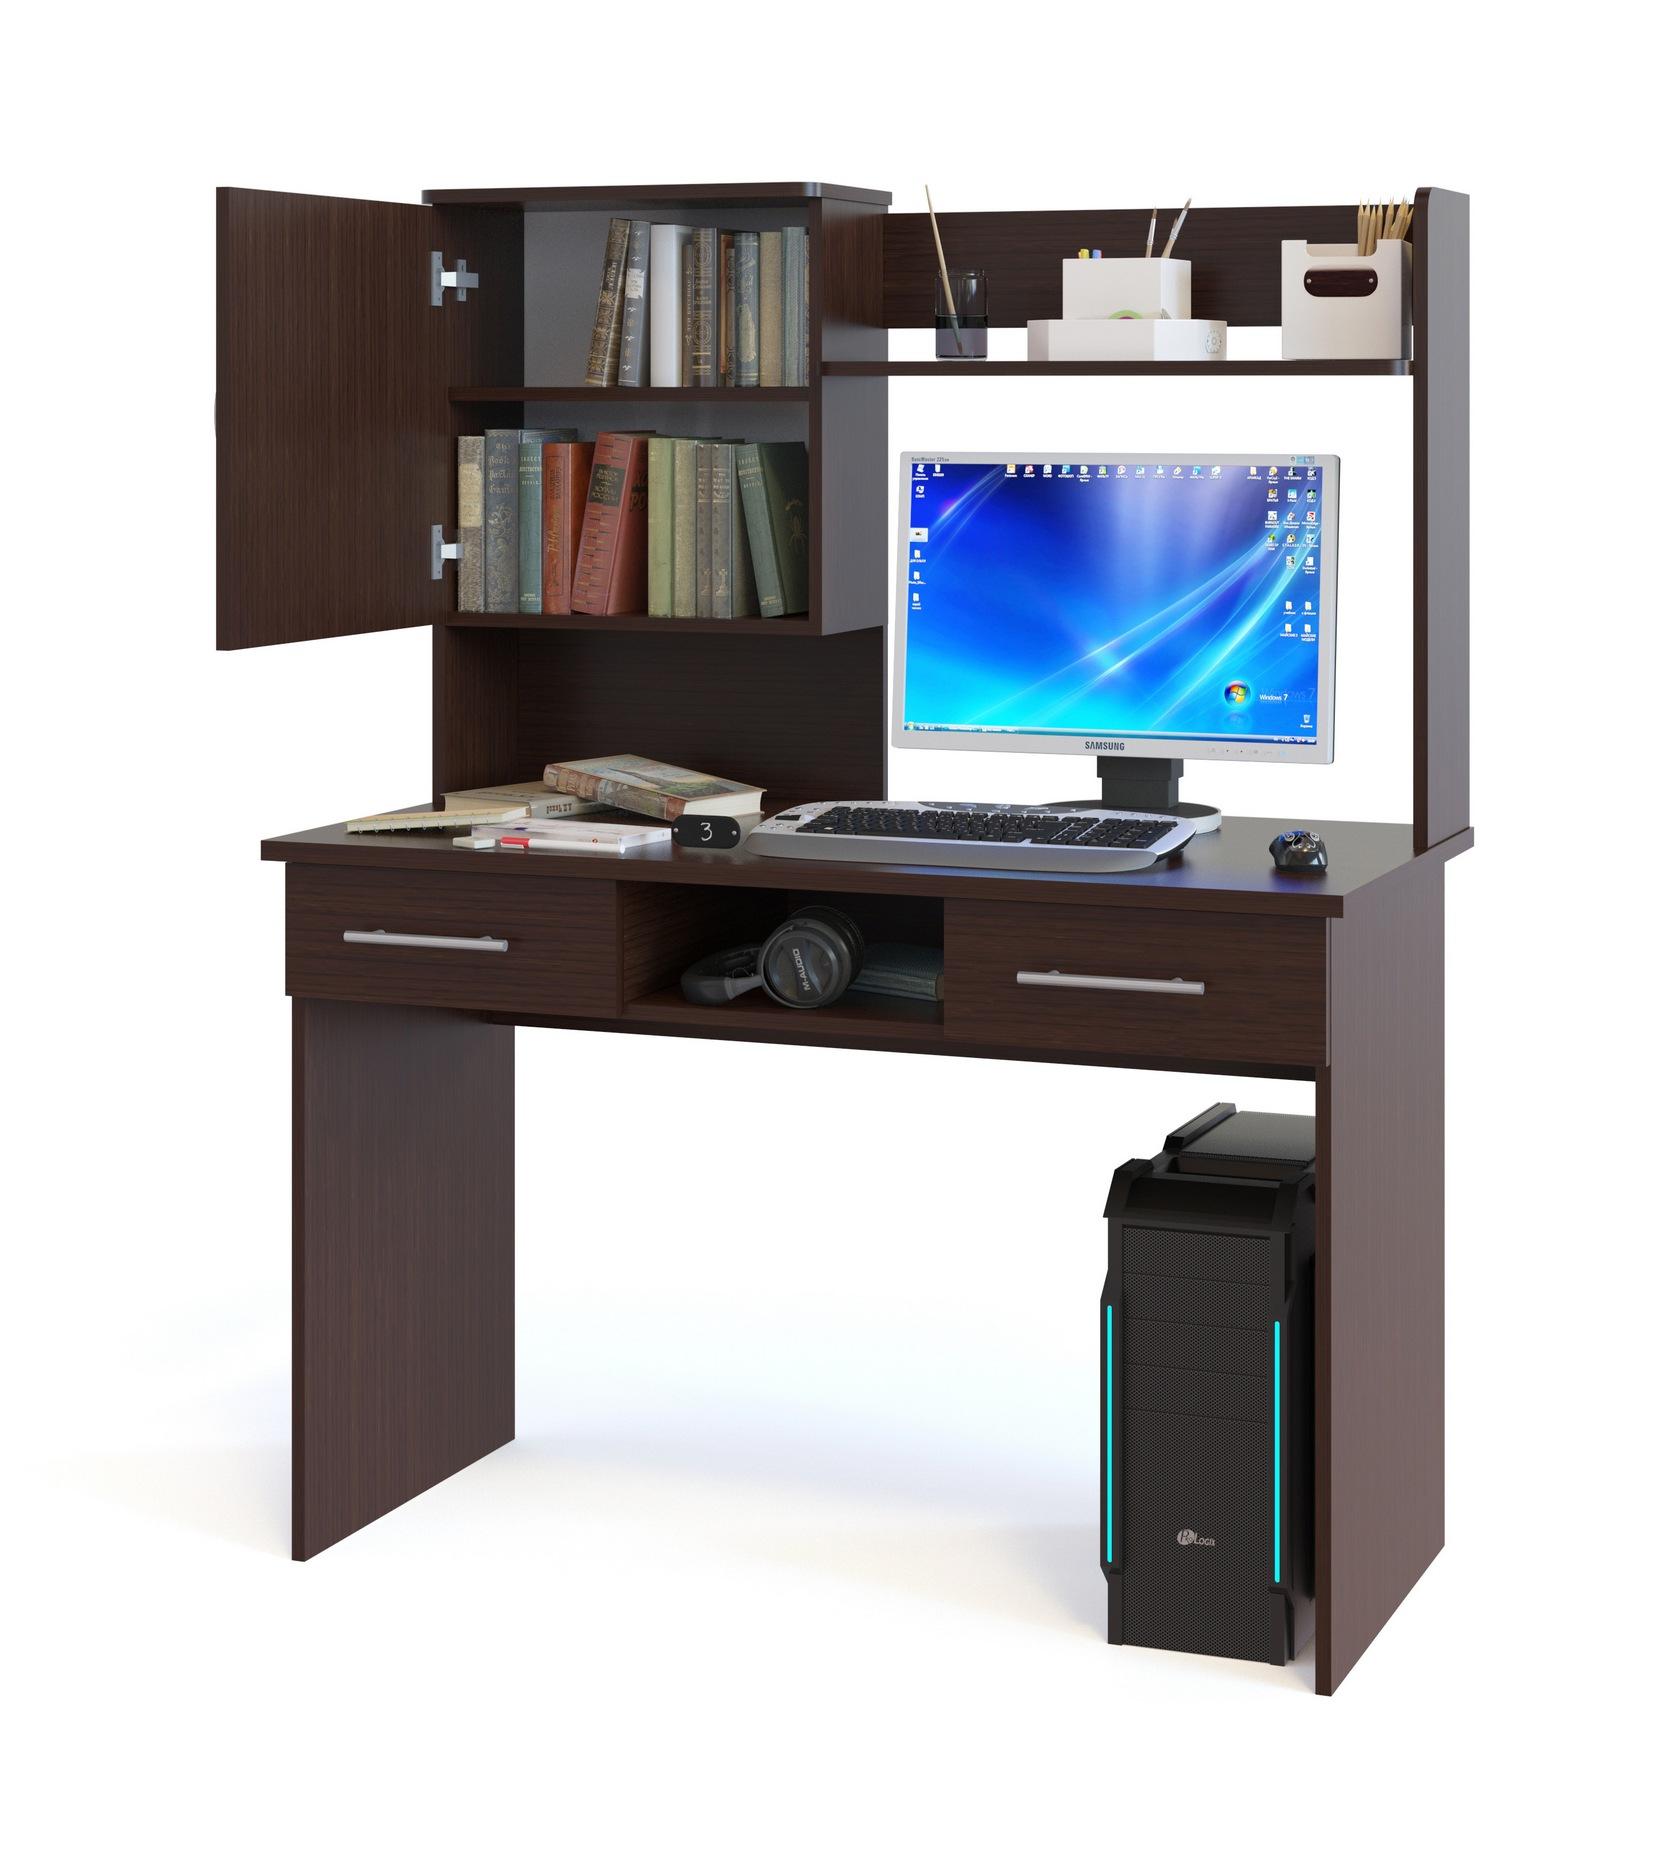 Компьютерный стол Сокол КСТ-107.1+КН-24 компьютерный стол сокол кст 107 1 кн 24 венге